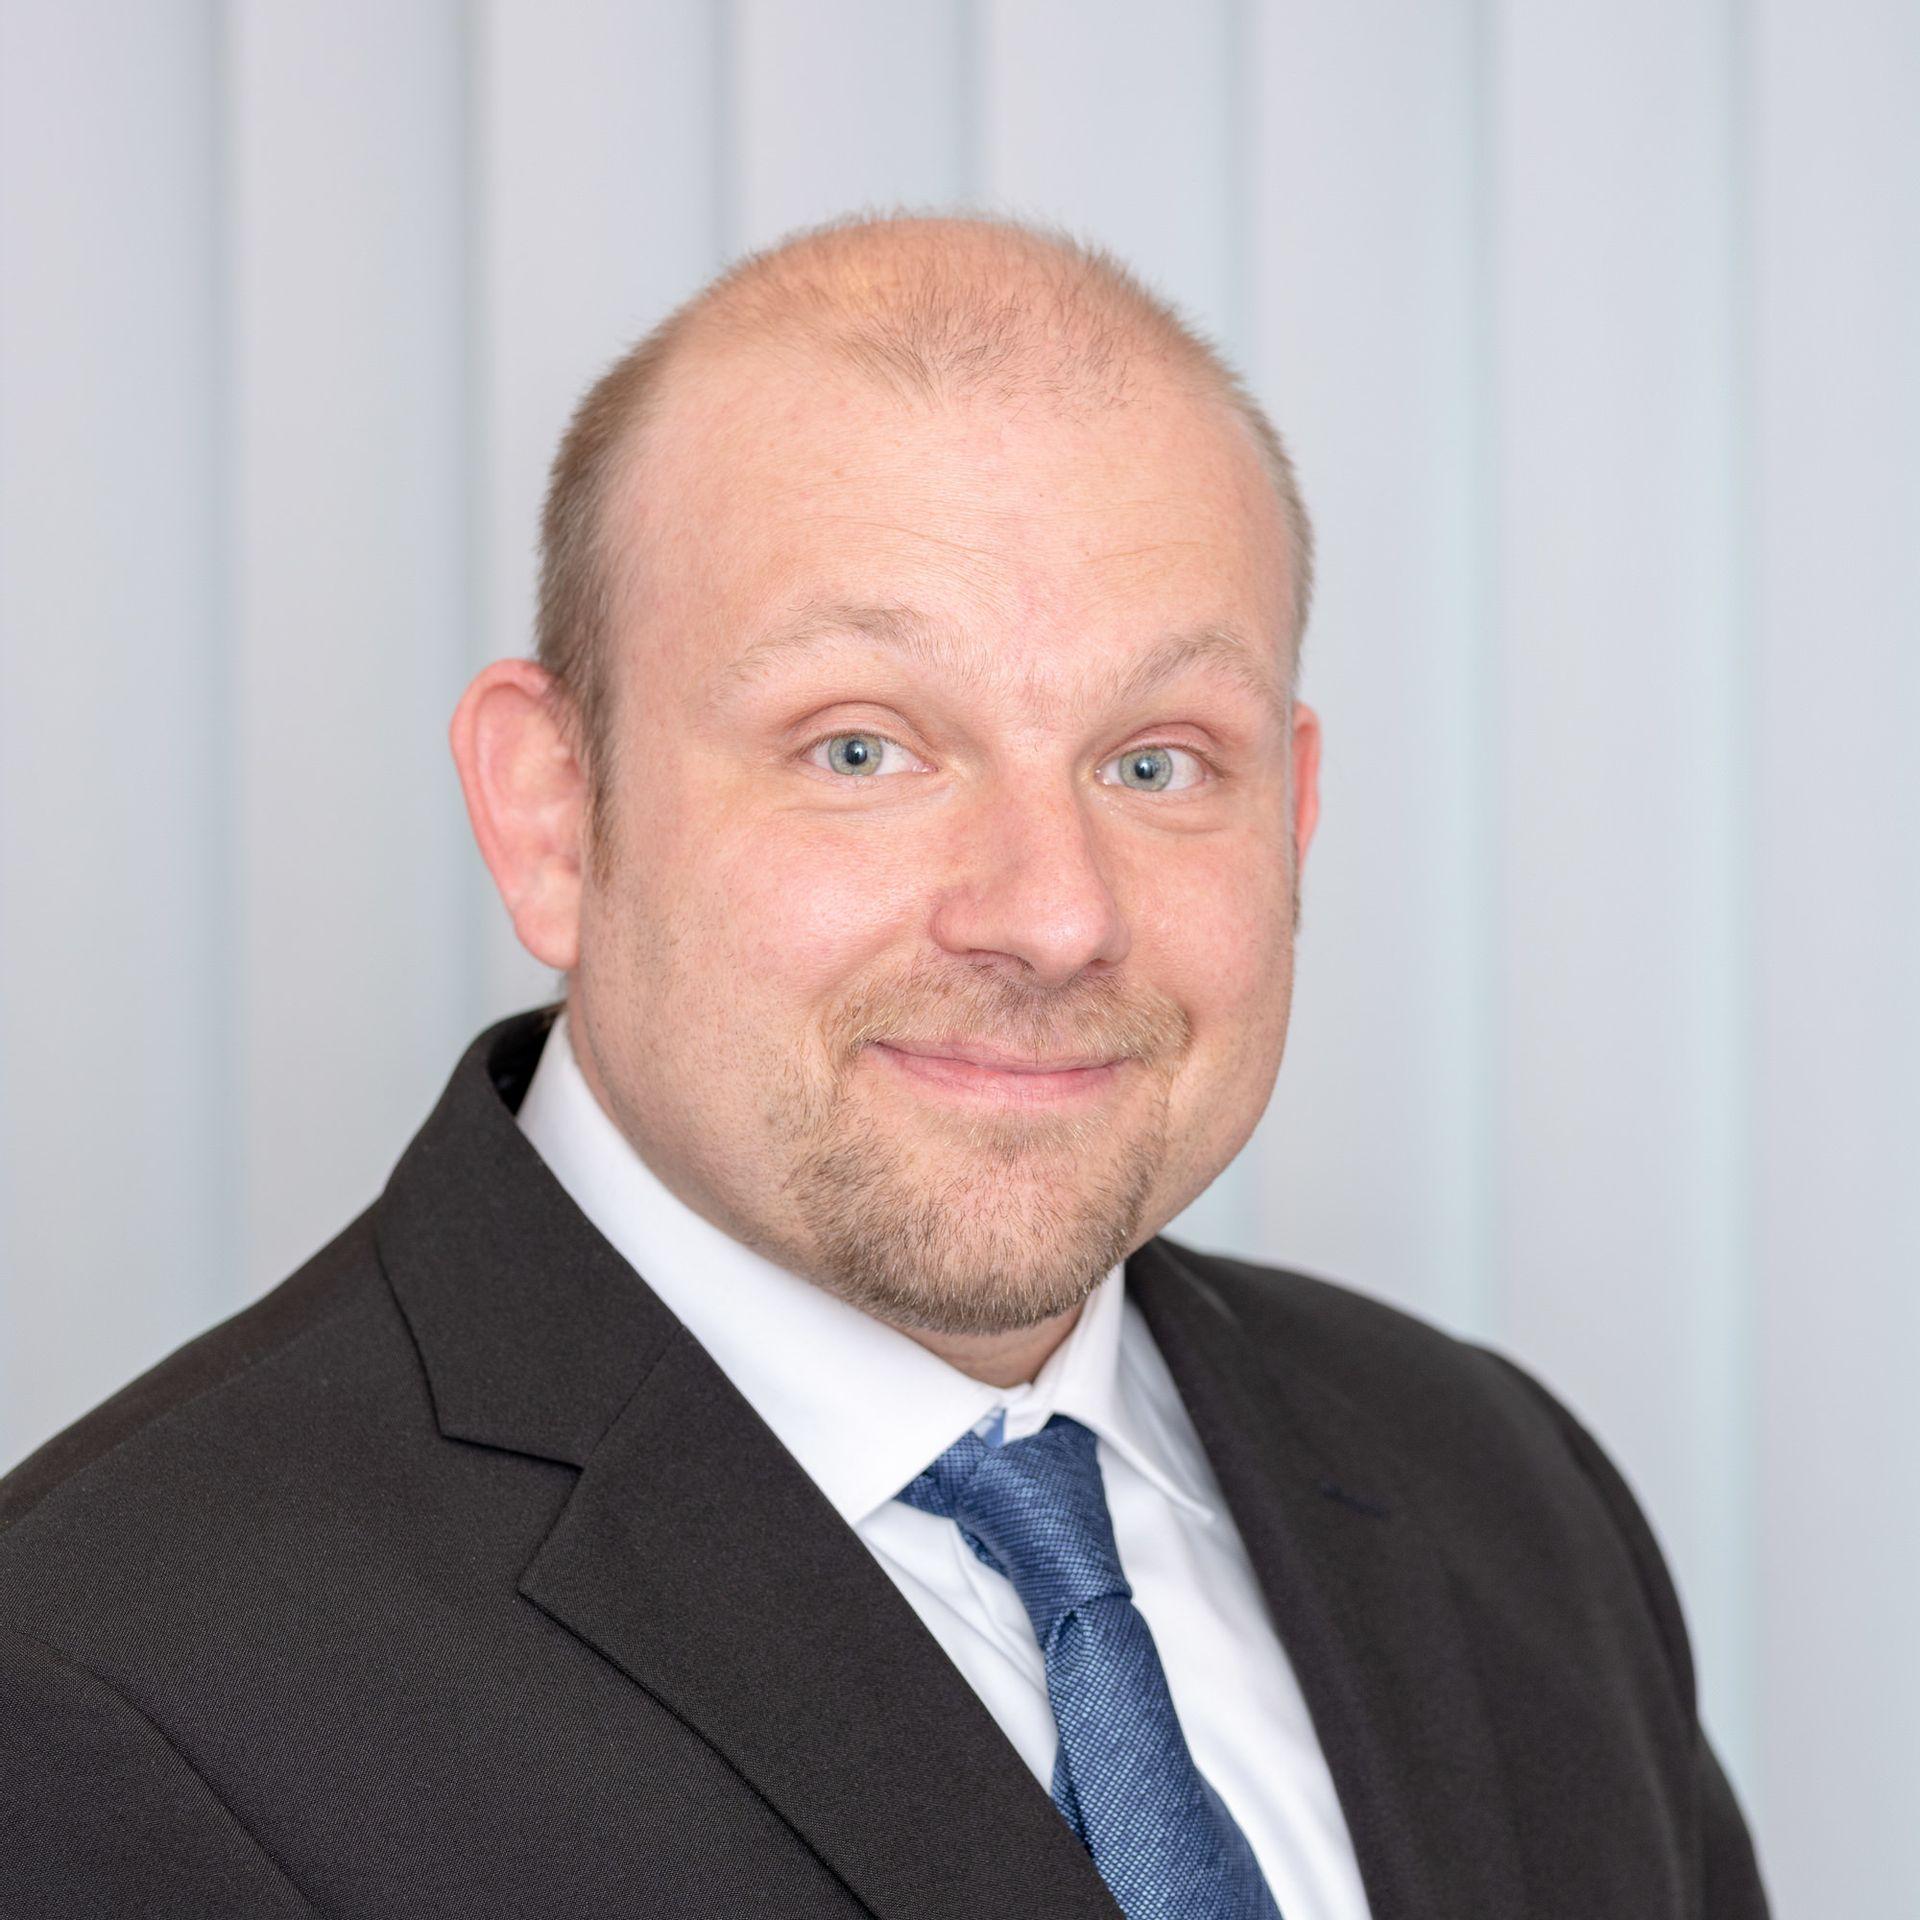 Rechtsanwalt Sebastian Gerhards | kanzleipraest